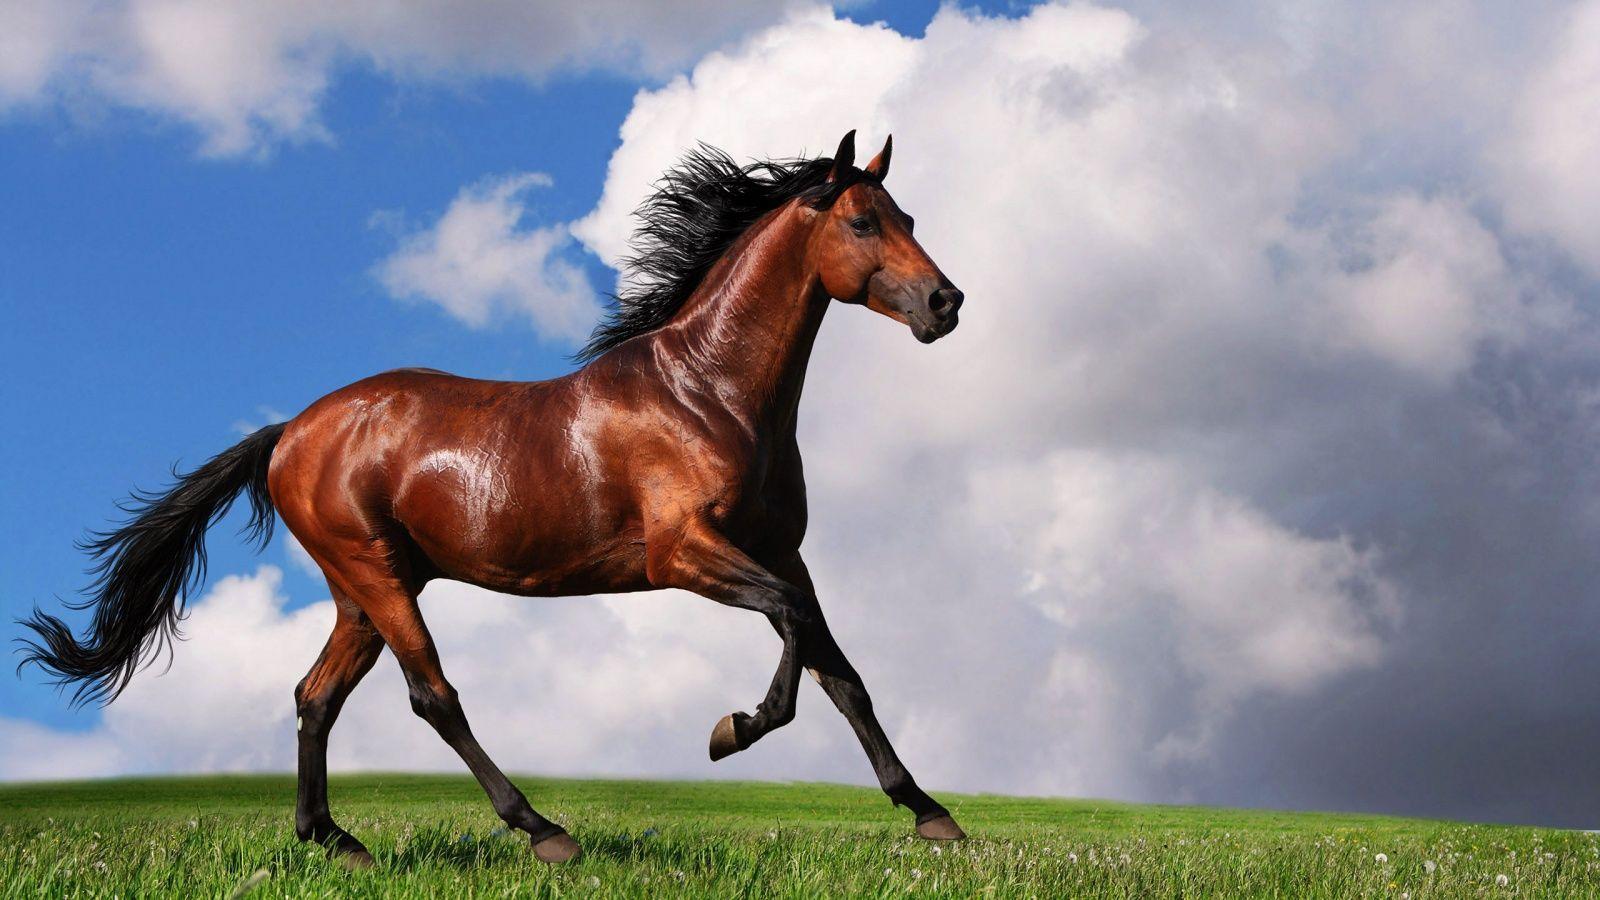 Beautiful Wallpaper Horse Desktop Background - 590818019717f87e927e919128c869ce  You Should Have_485685.jpg